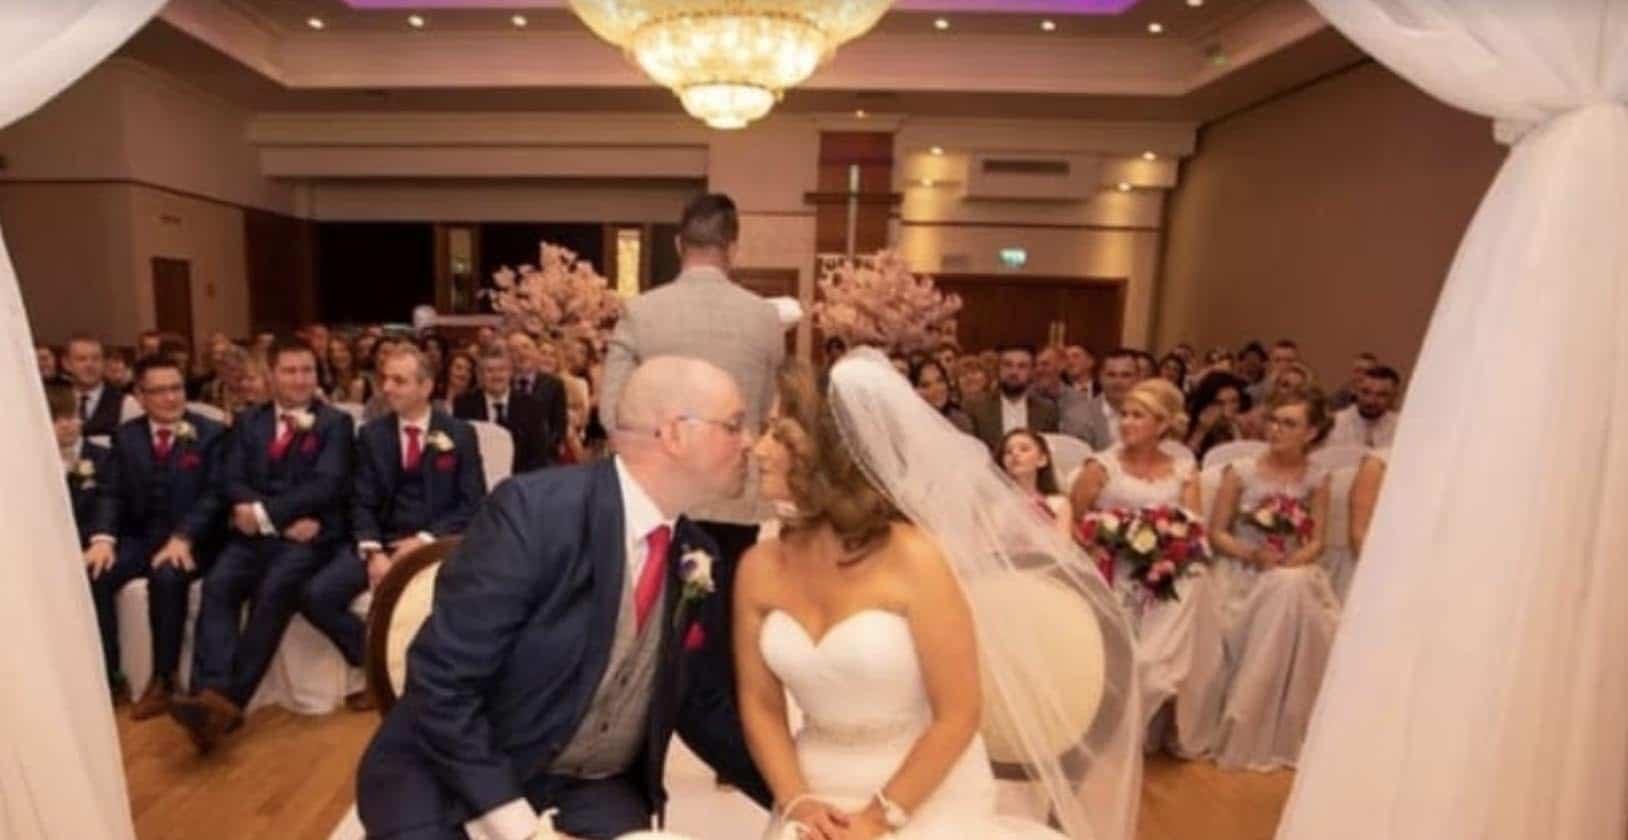 spiritual ceremonies wedding celebrants testimonial 7 ireland